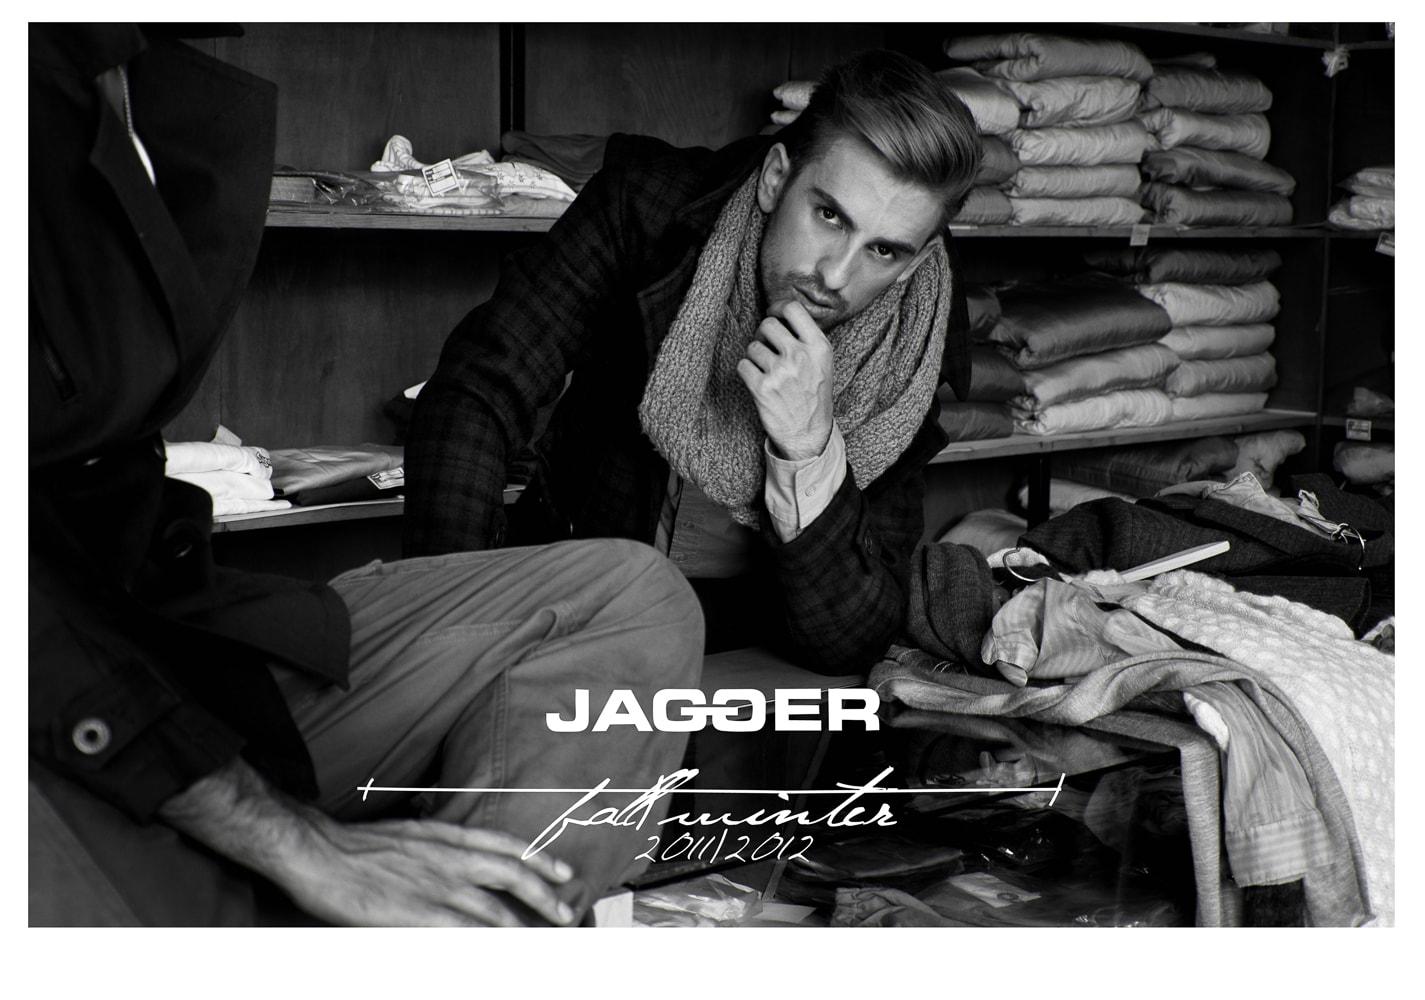 JAGGER BRAND FW11/12